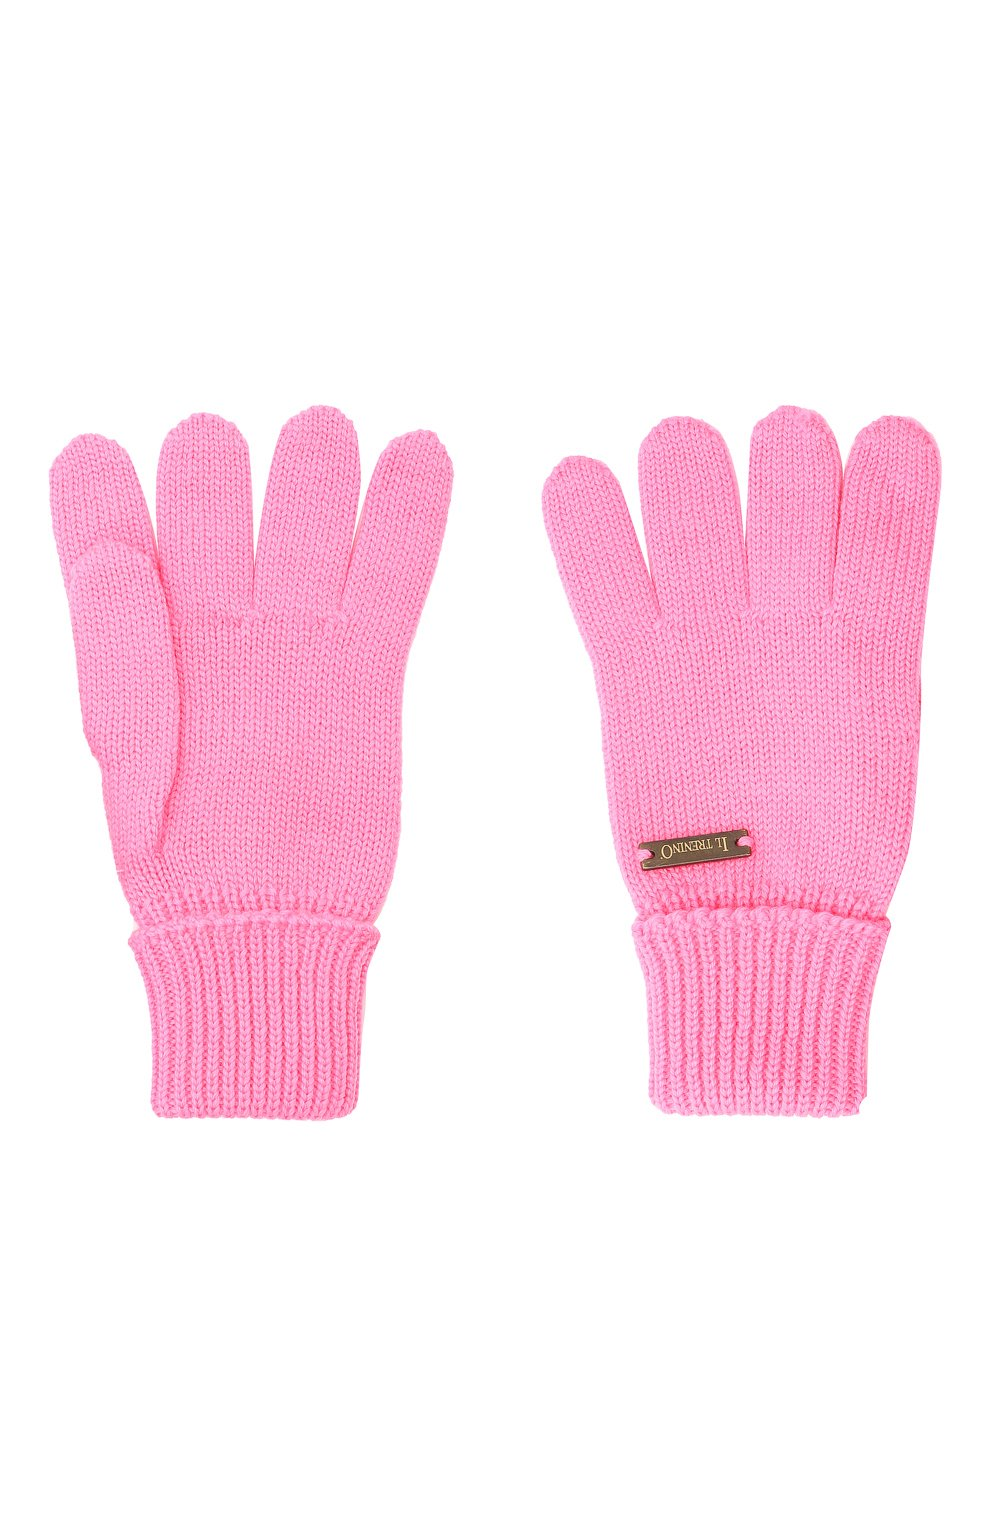 Детские шерстяные перчатки IL TRENINO розового цвета, арт. 20 4055/E0   Фото 2